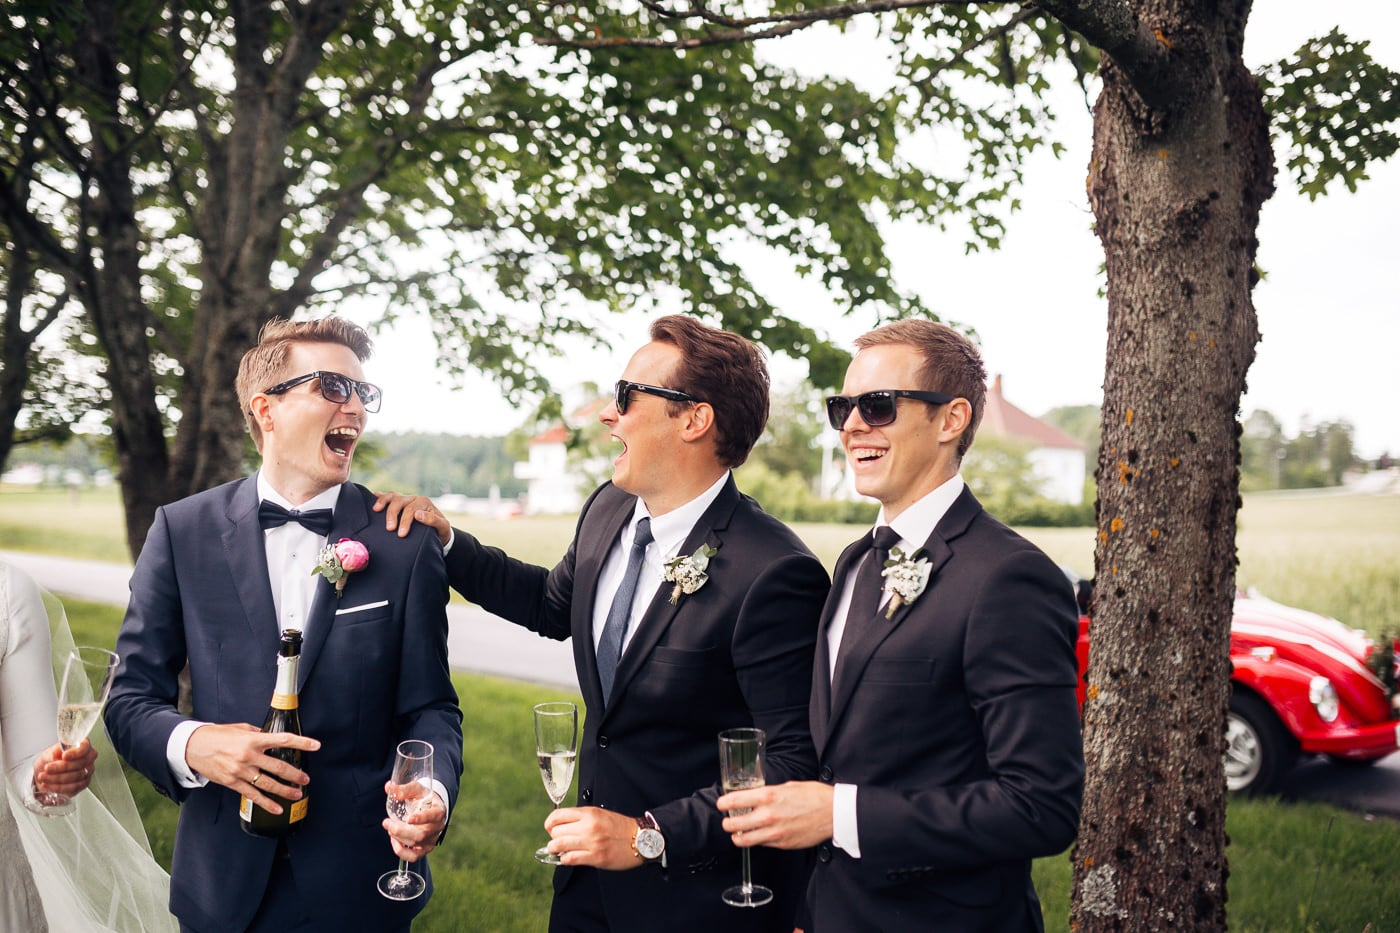 Karoline & Andreas - bryllup i Østfold med magiske detaljer Bryllup Fredrikstad Fotograf 45